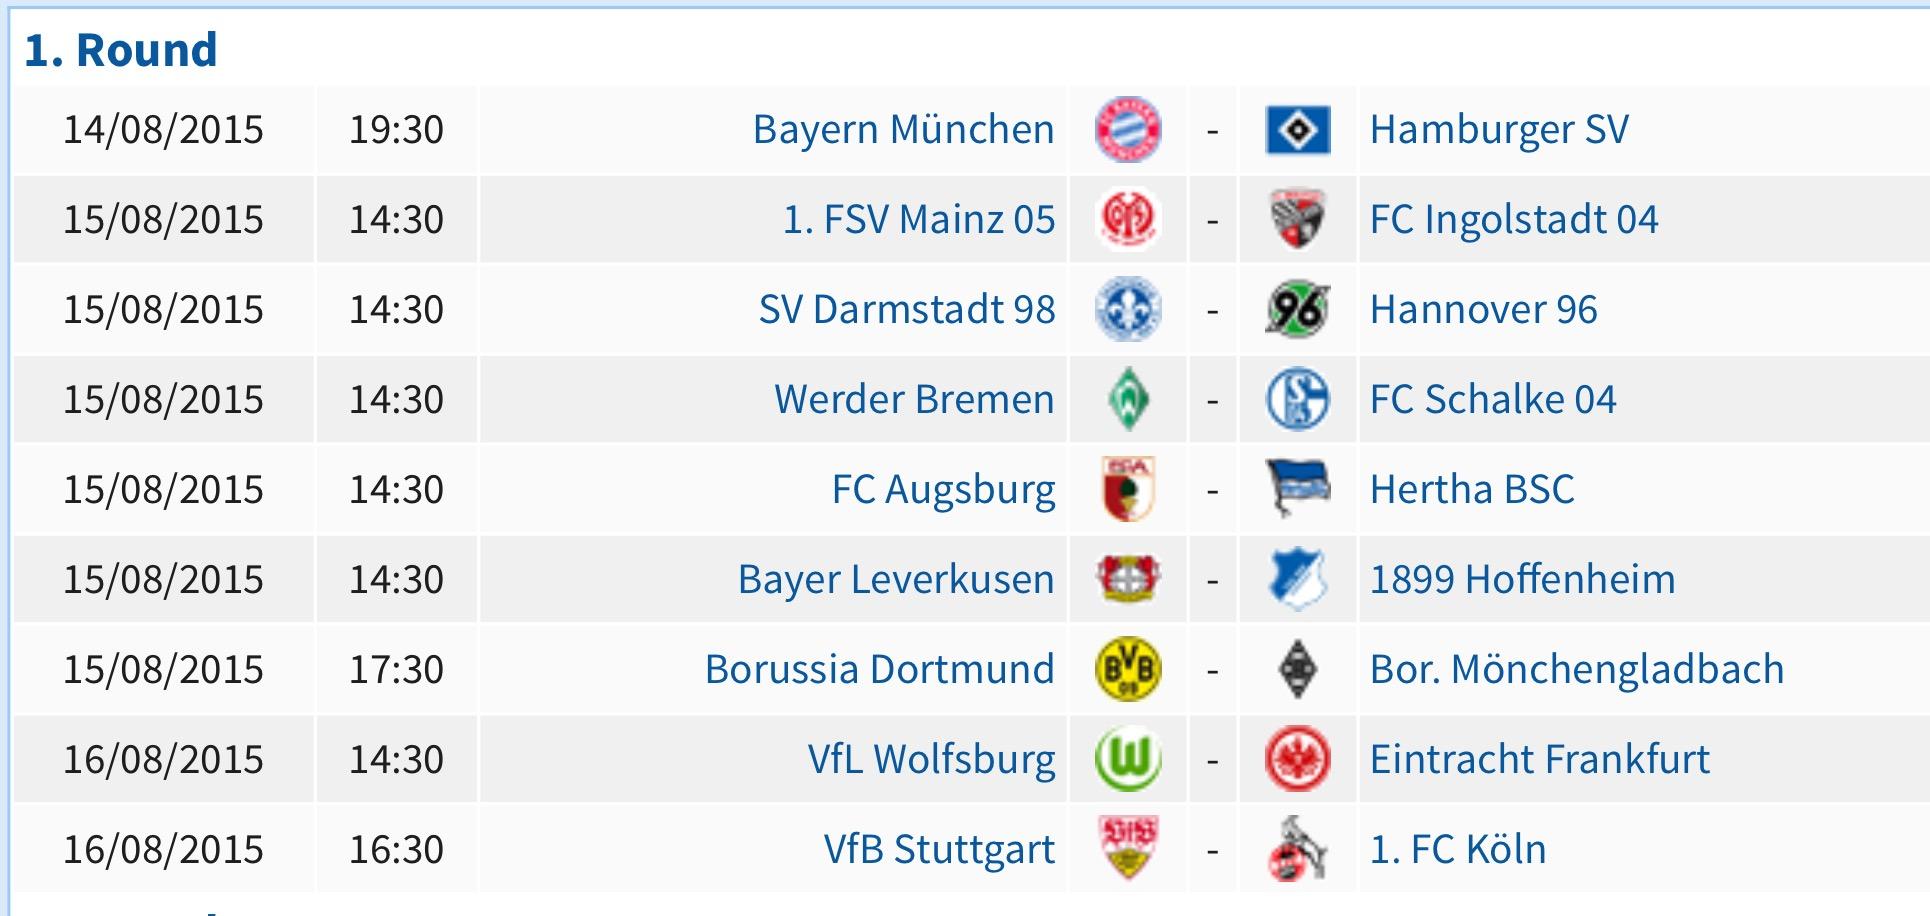 Bundesliga opening day fixtures 2015 2016 soccer box - Bundesliga premier league table ...